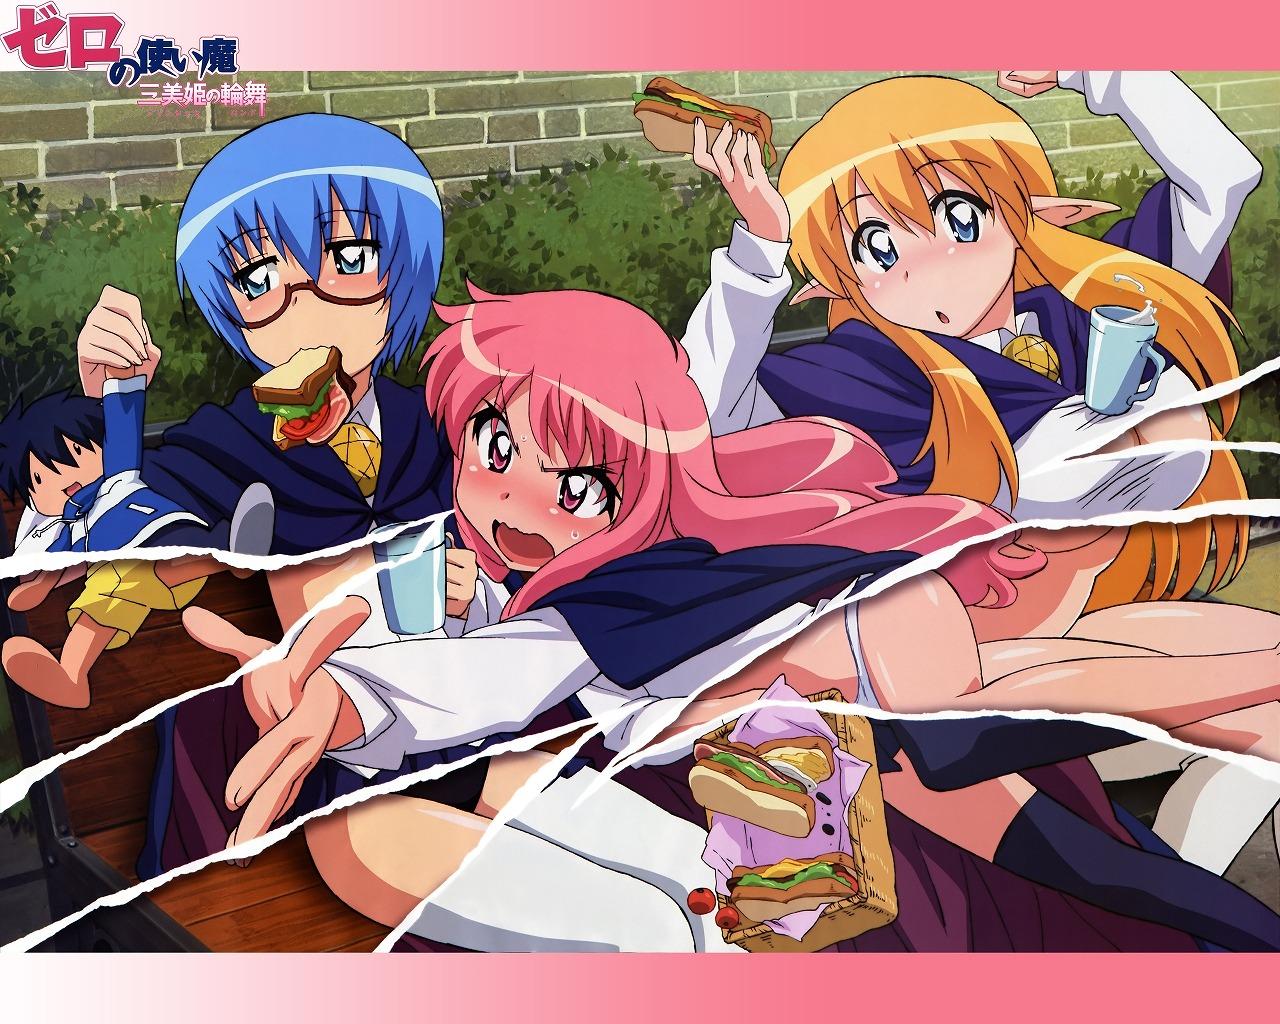 zeroNoTsukaimaSaison3_wallpaper_5875.jpg